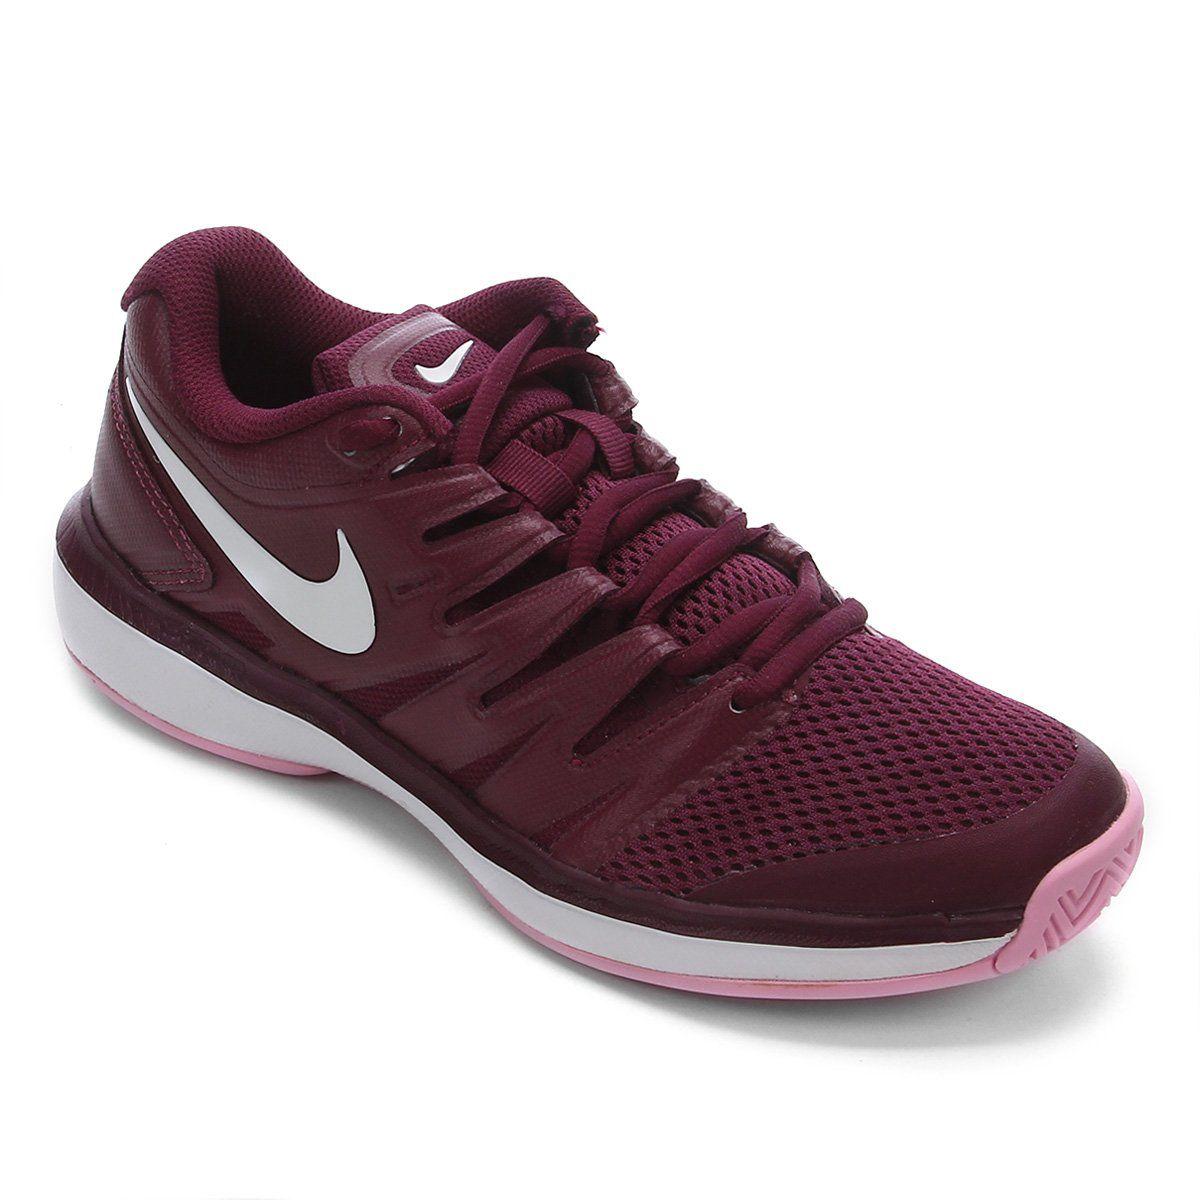 Tenis Nike Zoom Prestige - Aa8024-603